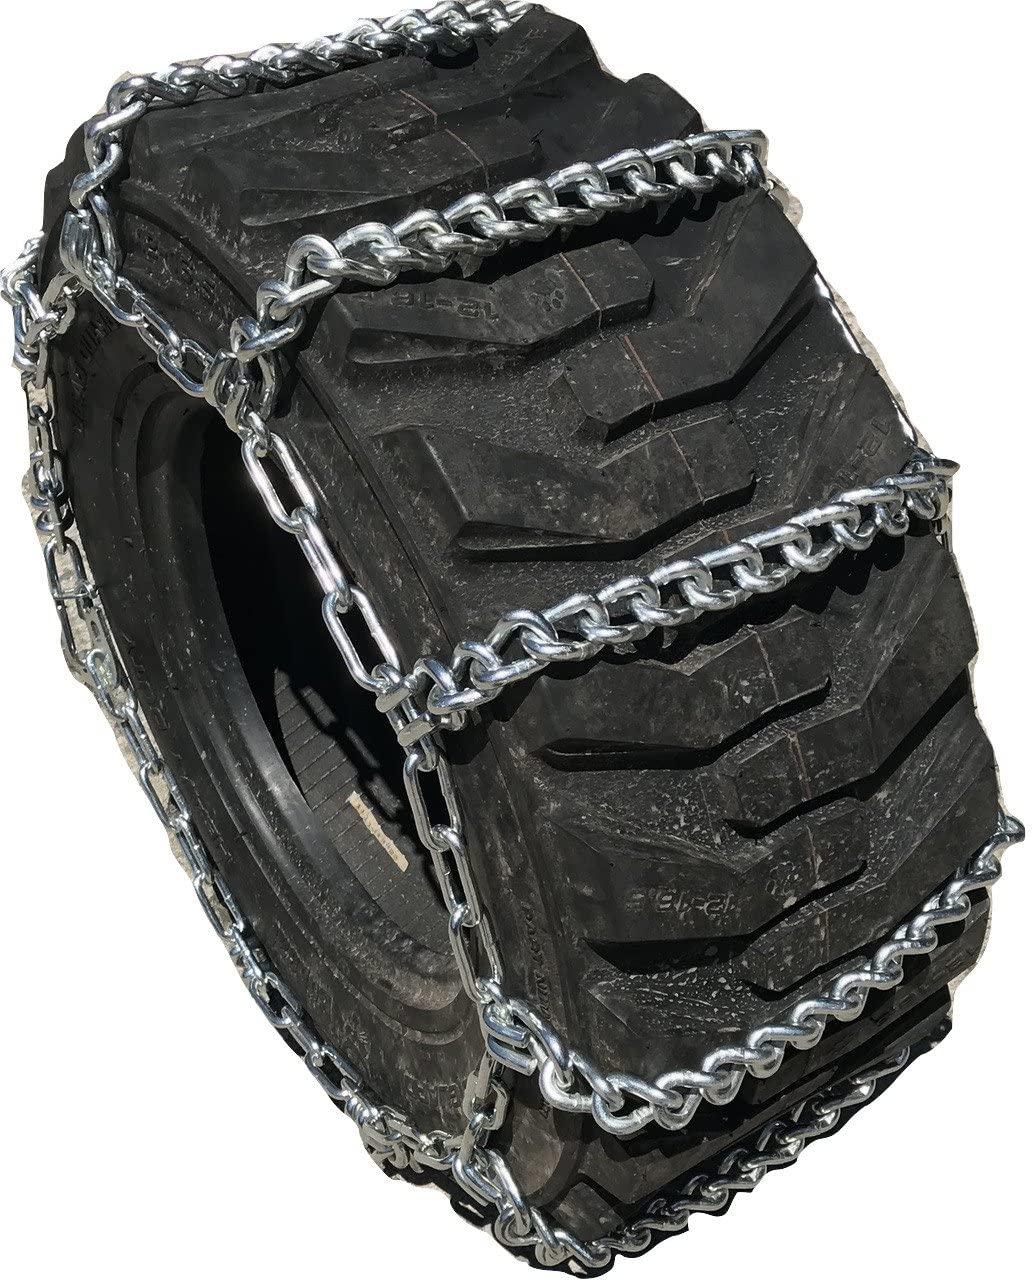 TireChain.com Compatible with John Deere 5090EL Front 7.2-24, 9.5-24, 12.5/80-18 Tire Chains